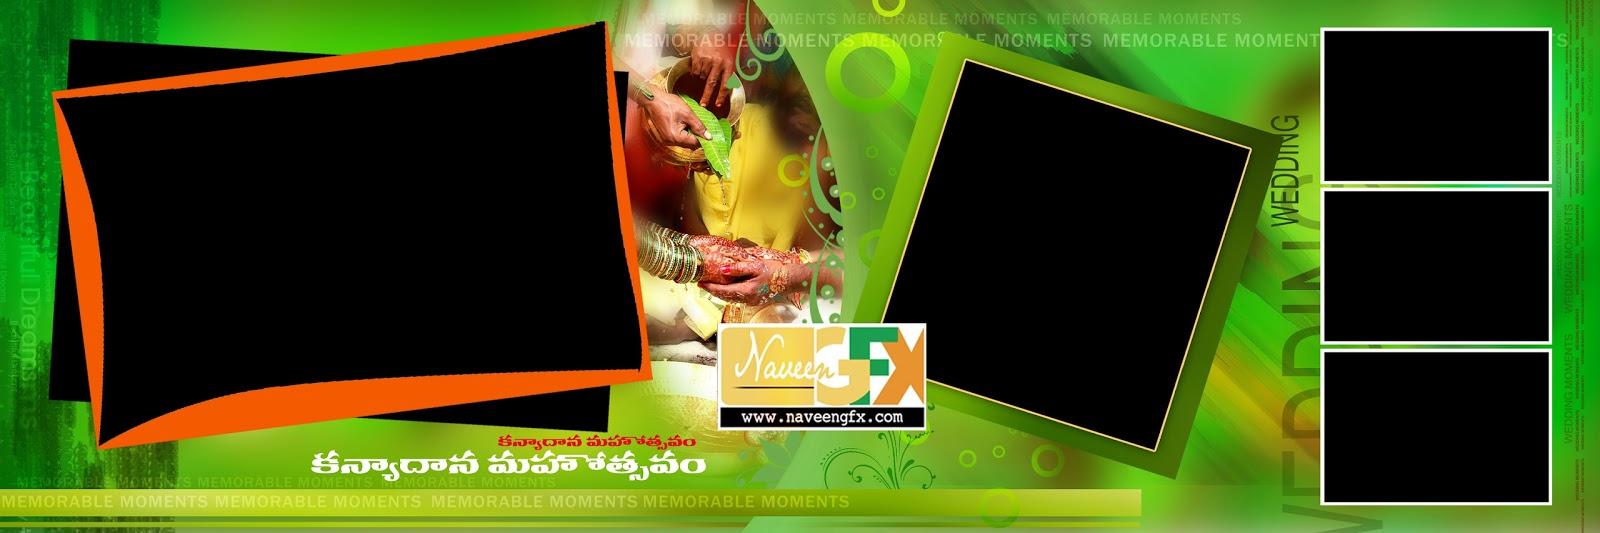 12x36 Indian Wedding Banner Psd Template Free Downloads